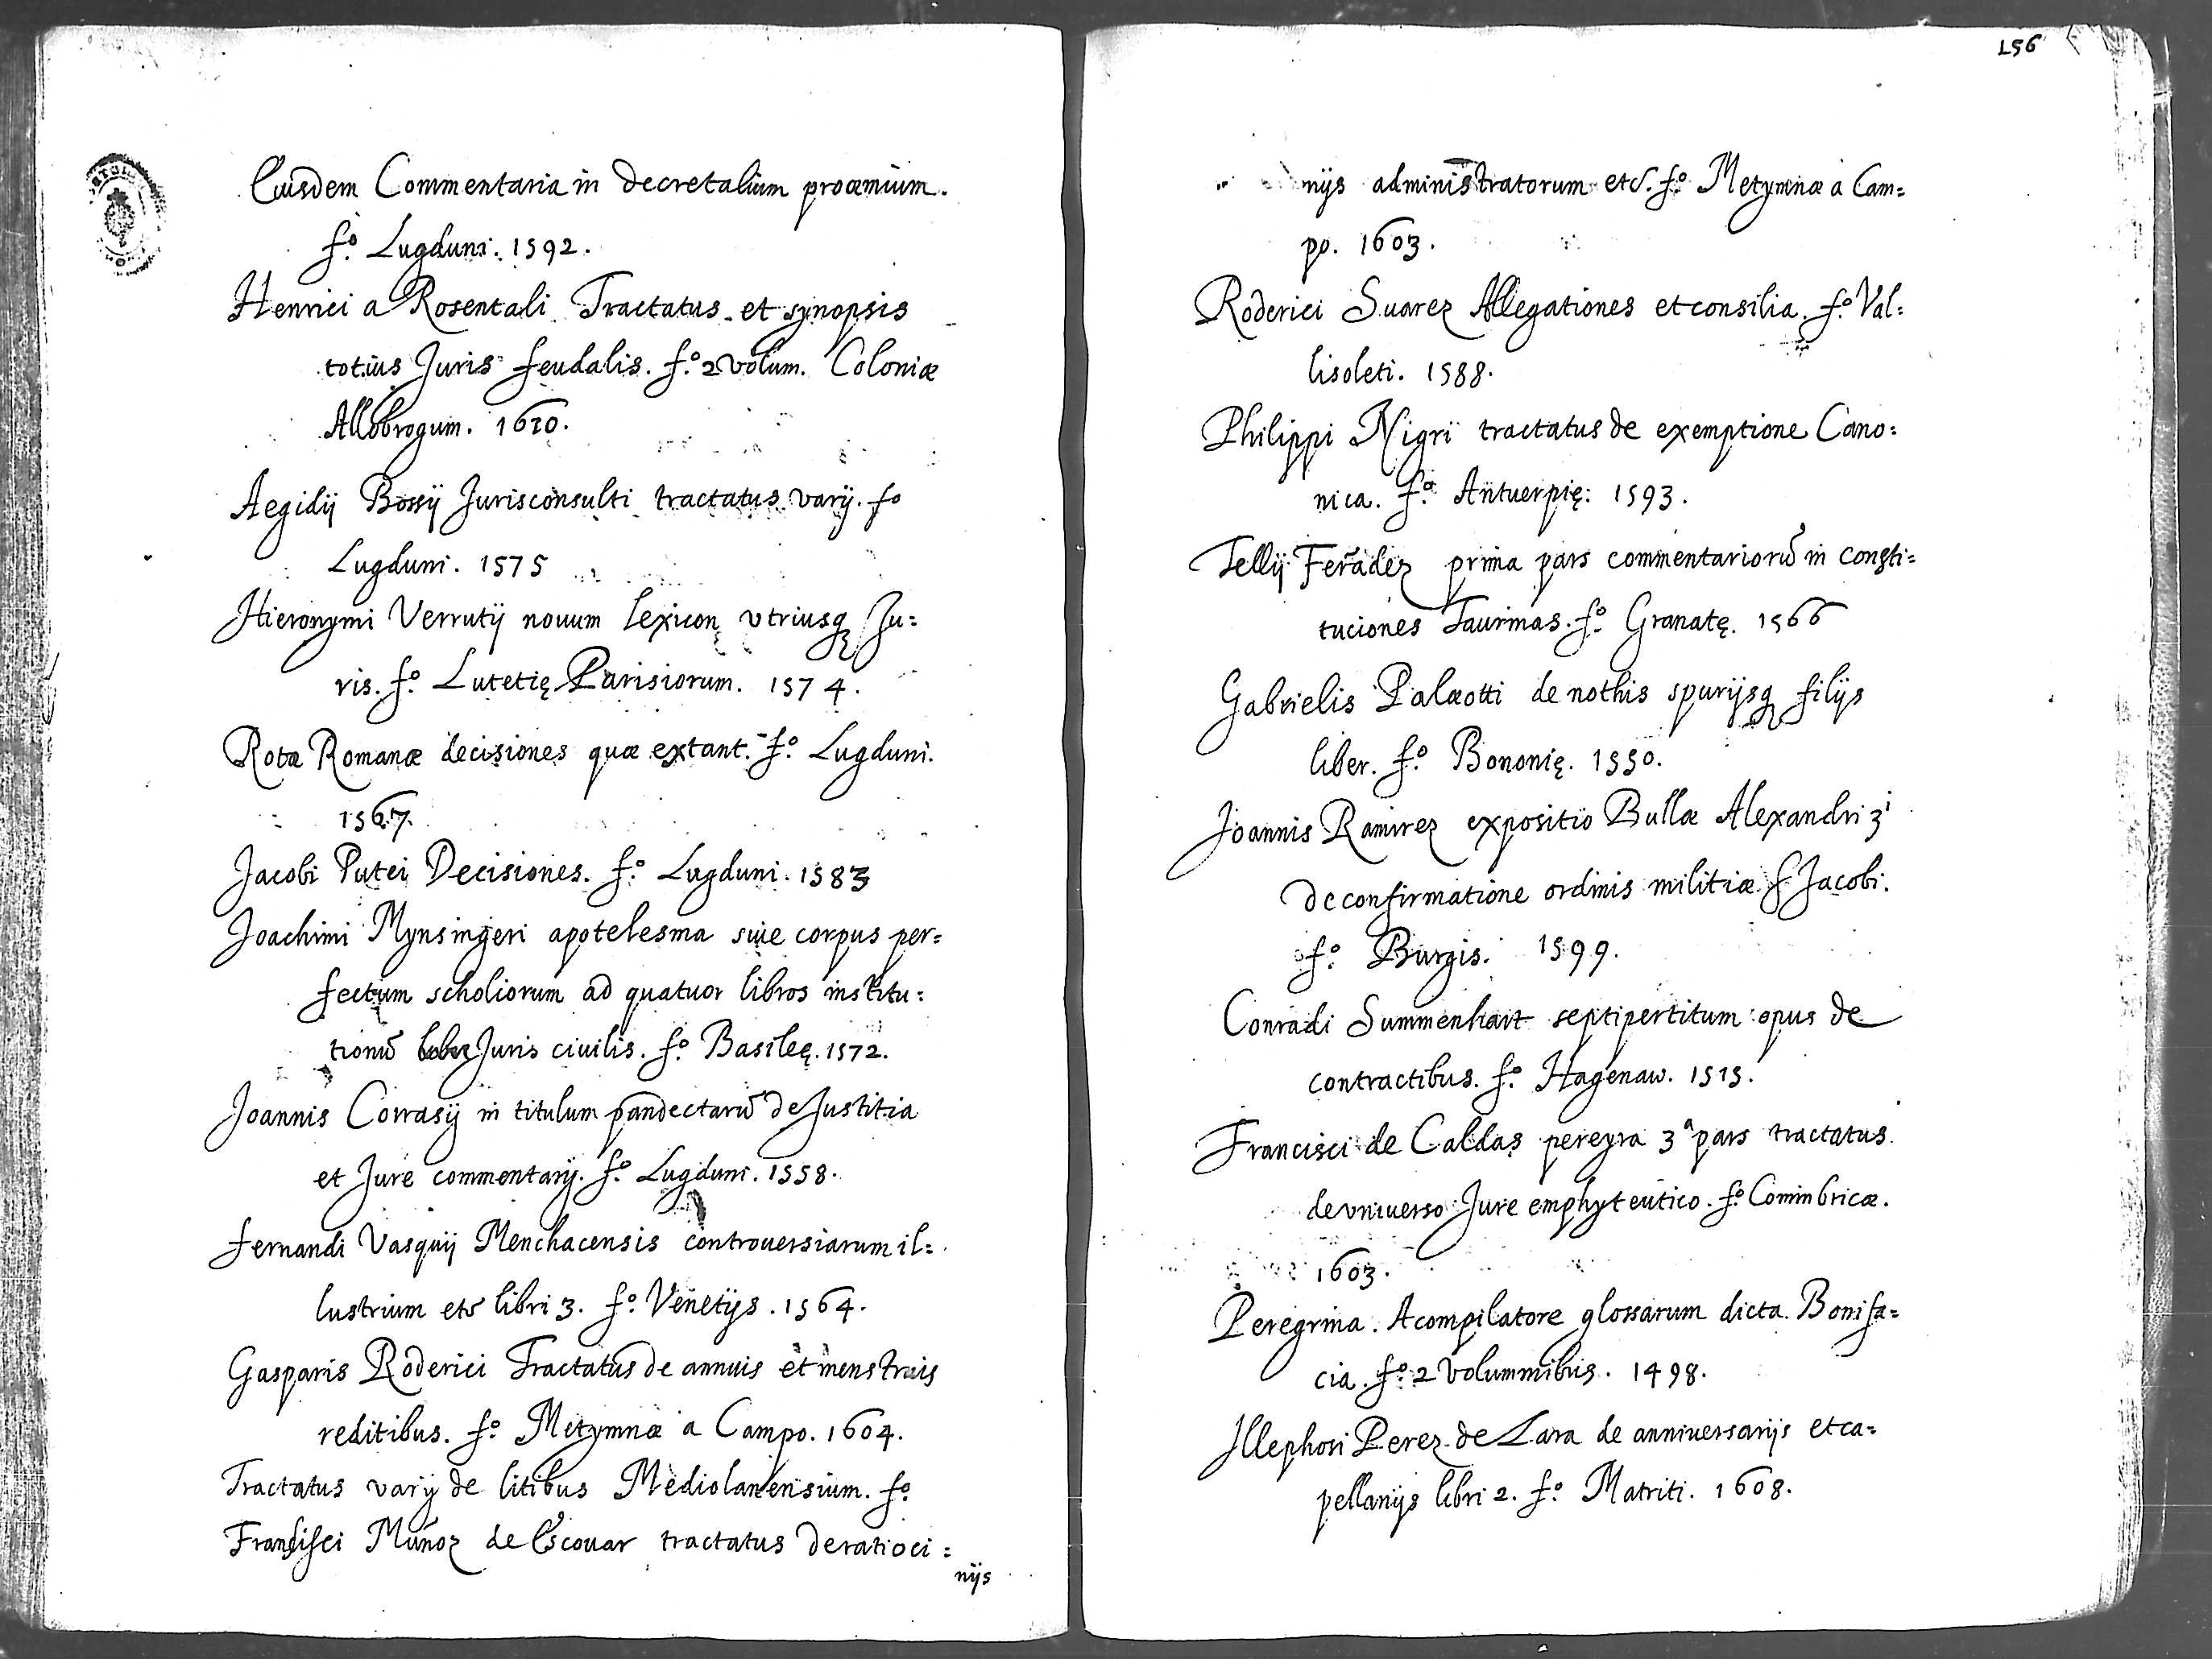 Eiusdem, Partitiones Juris Canonicis. fº. Lugduni, 1594.